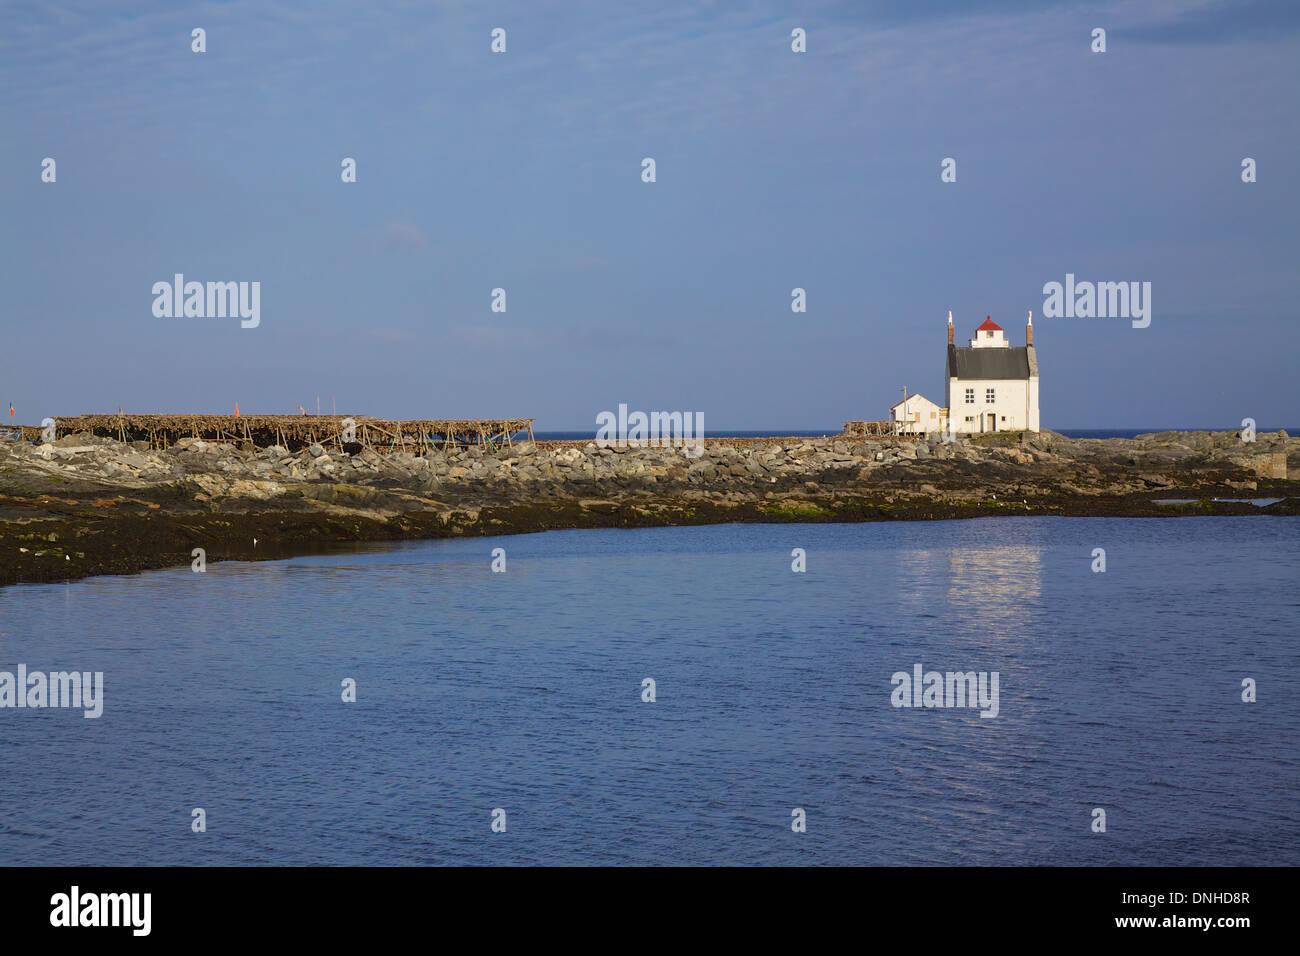 Scenic old norwegian lighthouse in port of Sorland on island Vaeroy, Lofoten, Norway - Stock Image